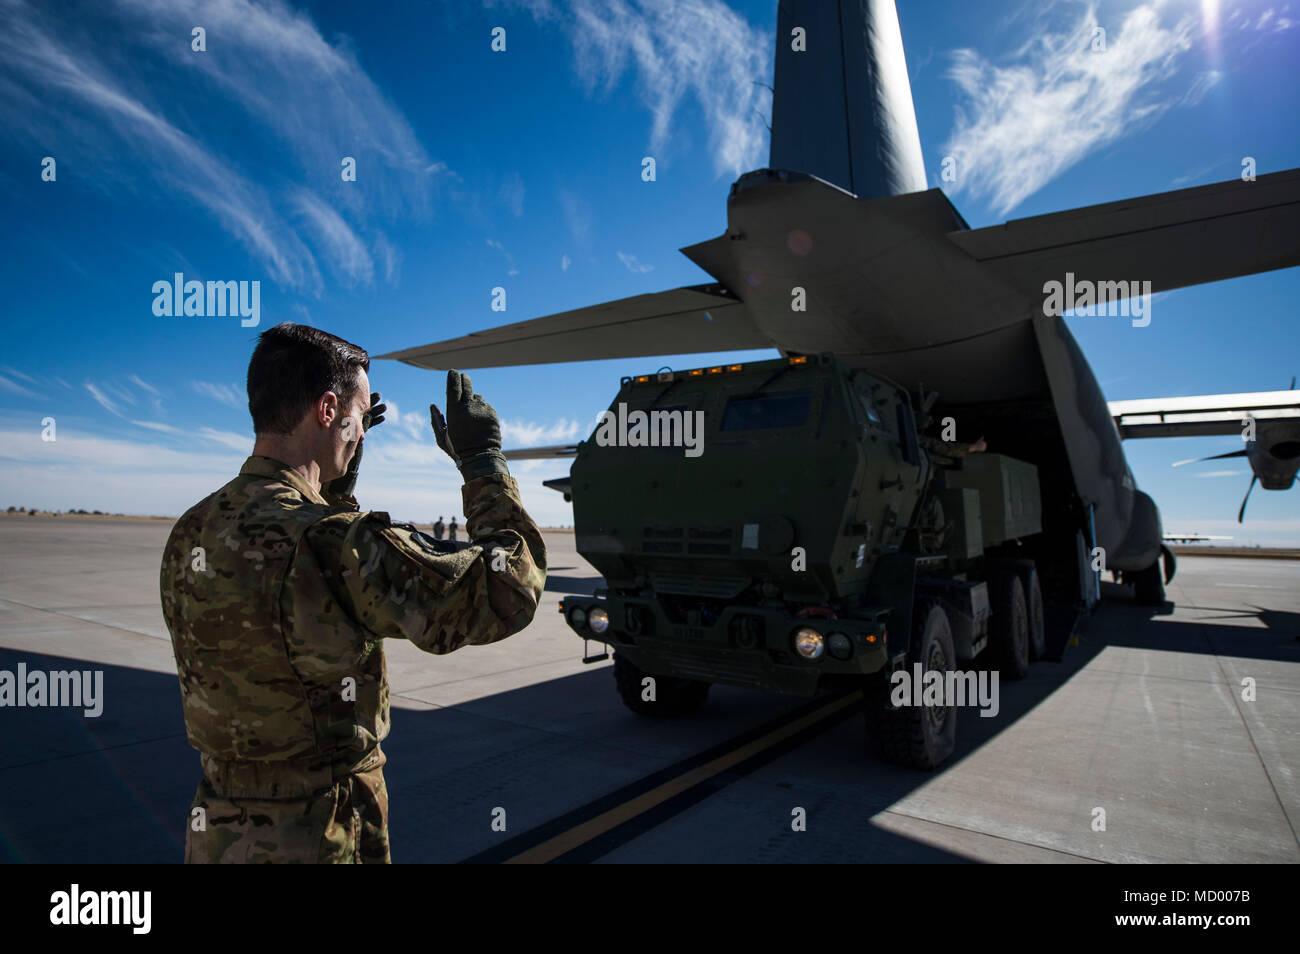 tech-sgt-michael-brown-a-mc-130j-command